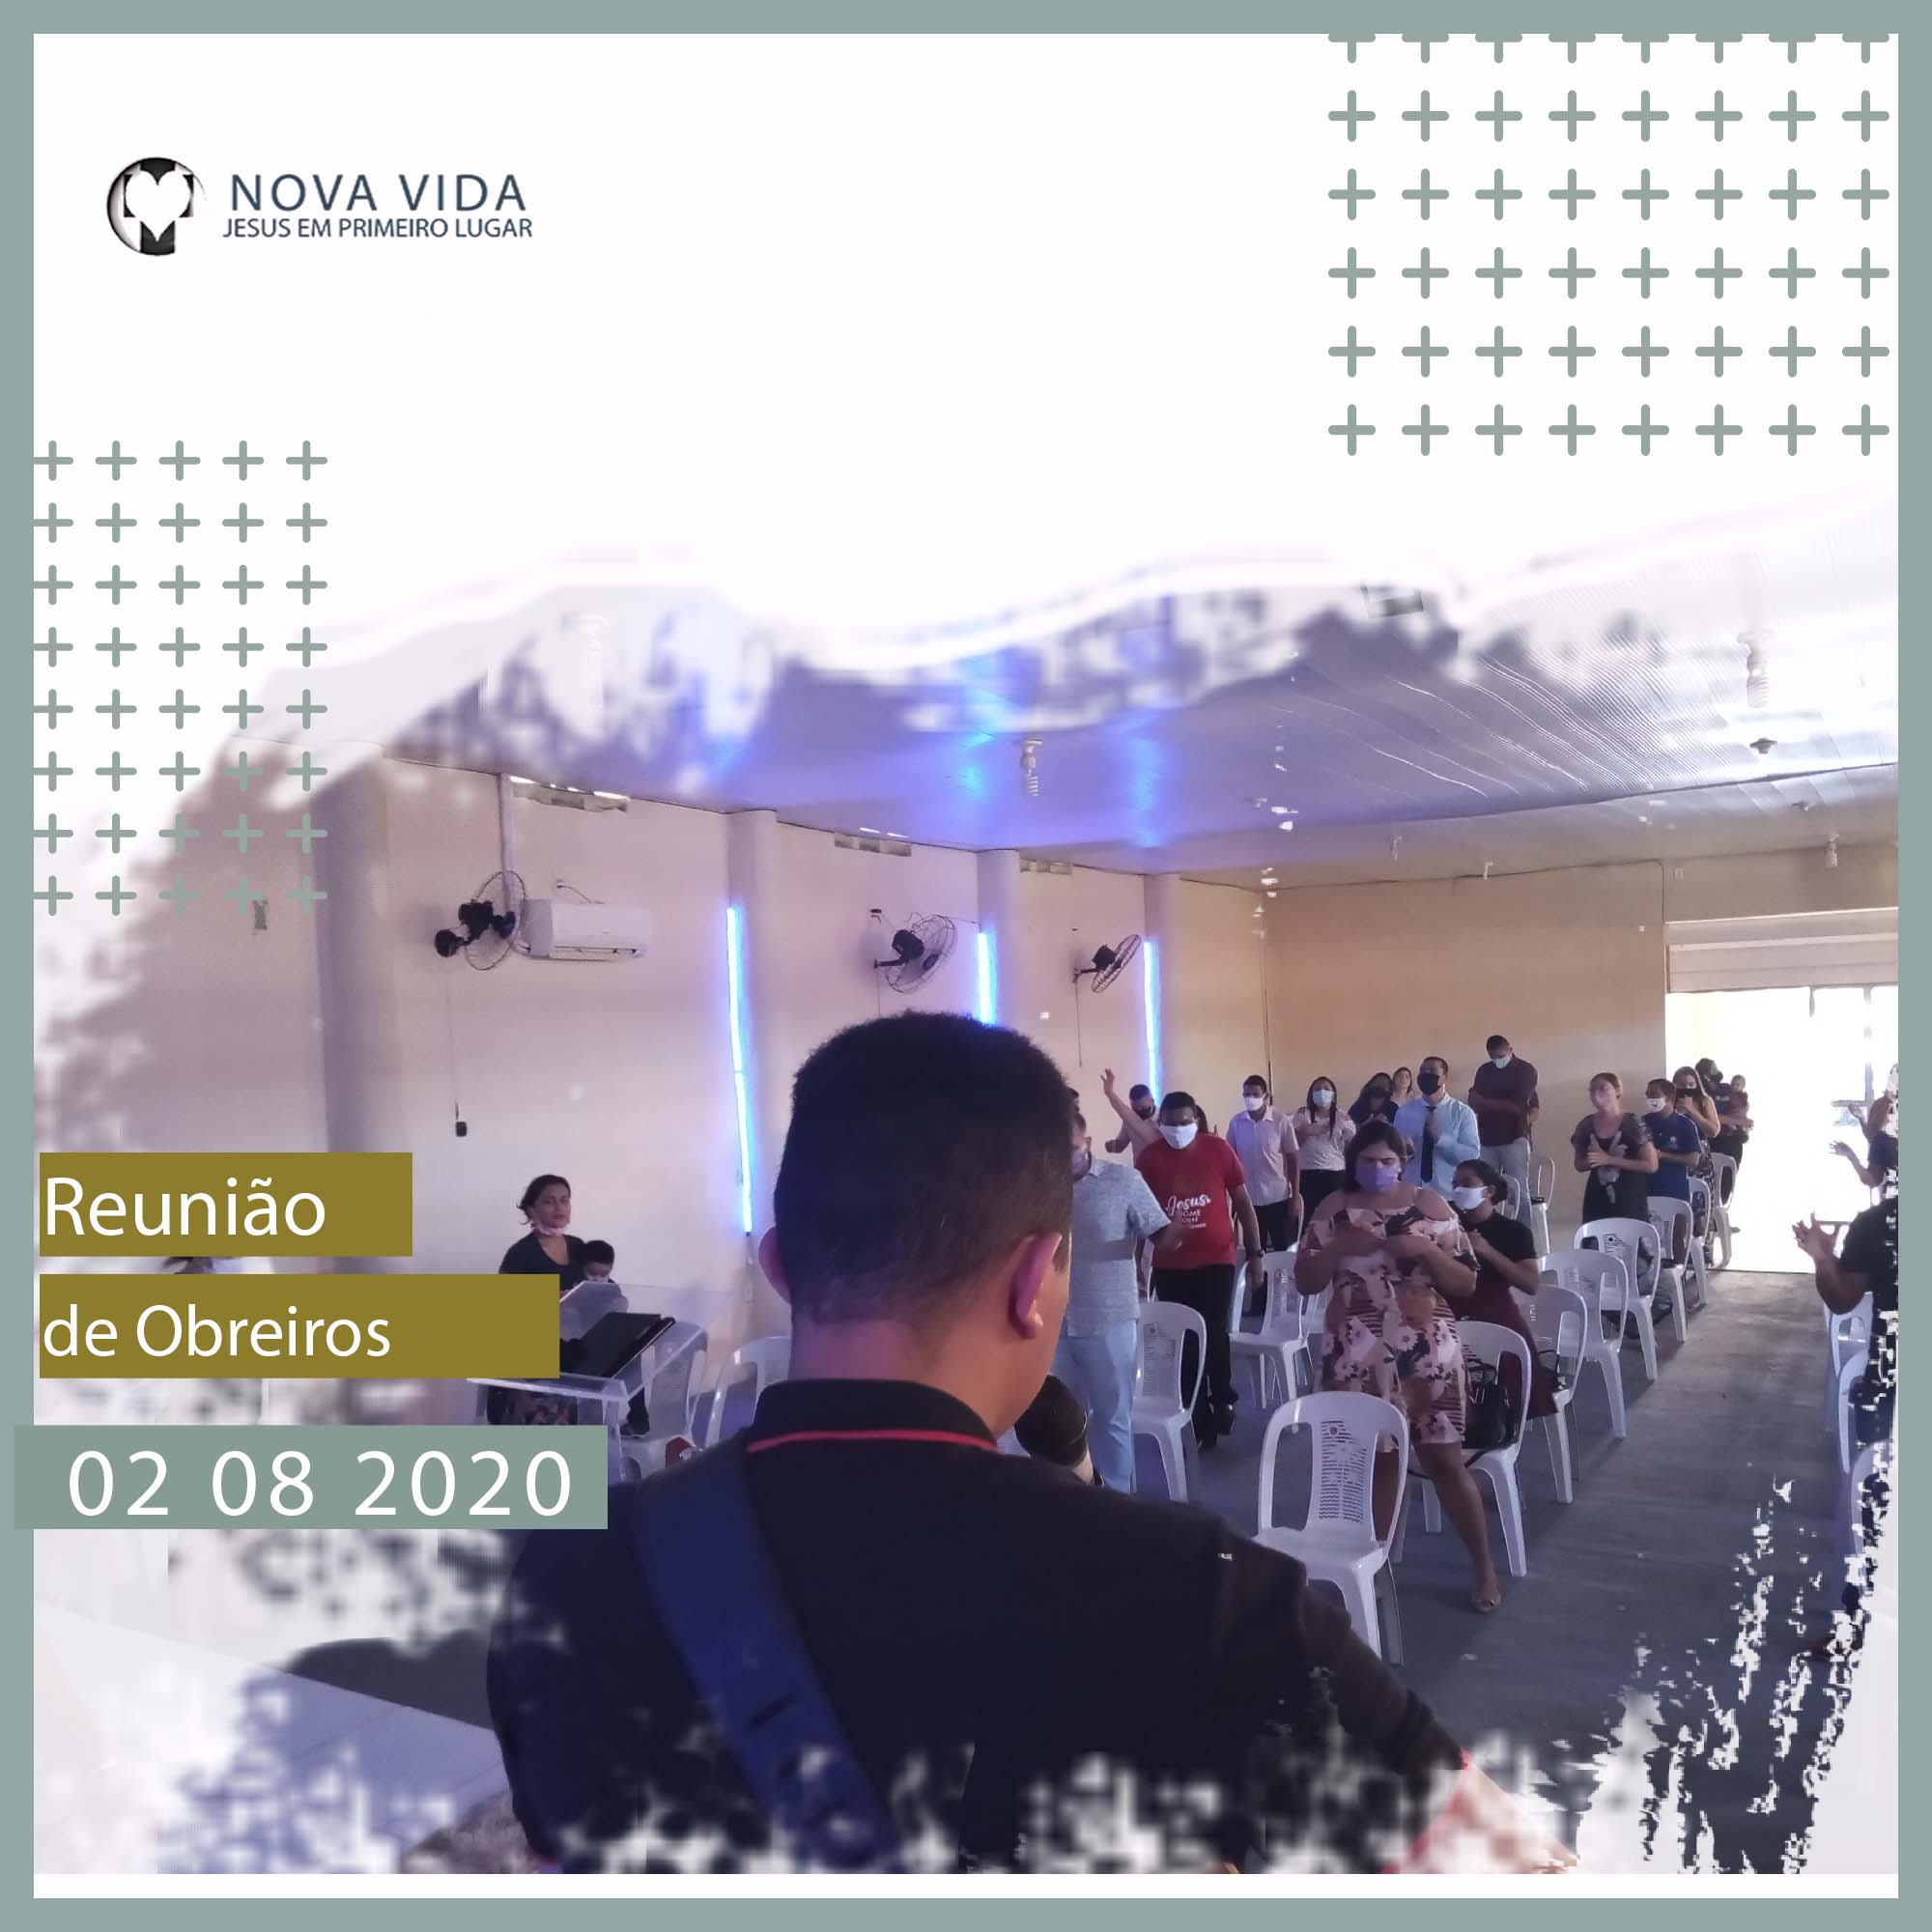 RO 02 08 2020 003